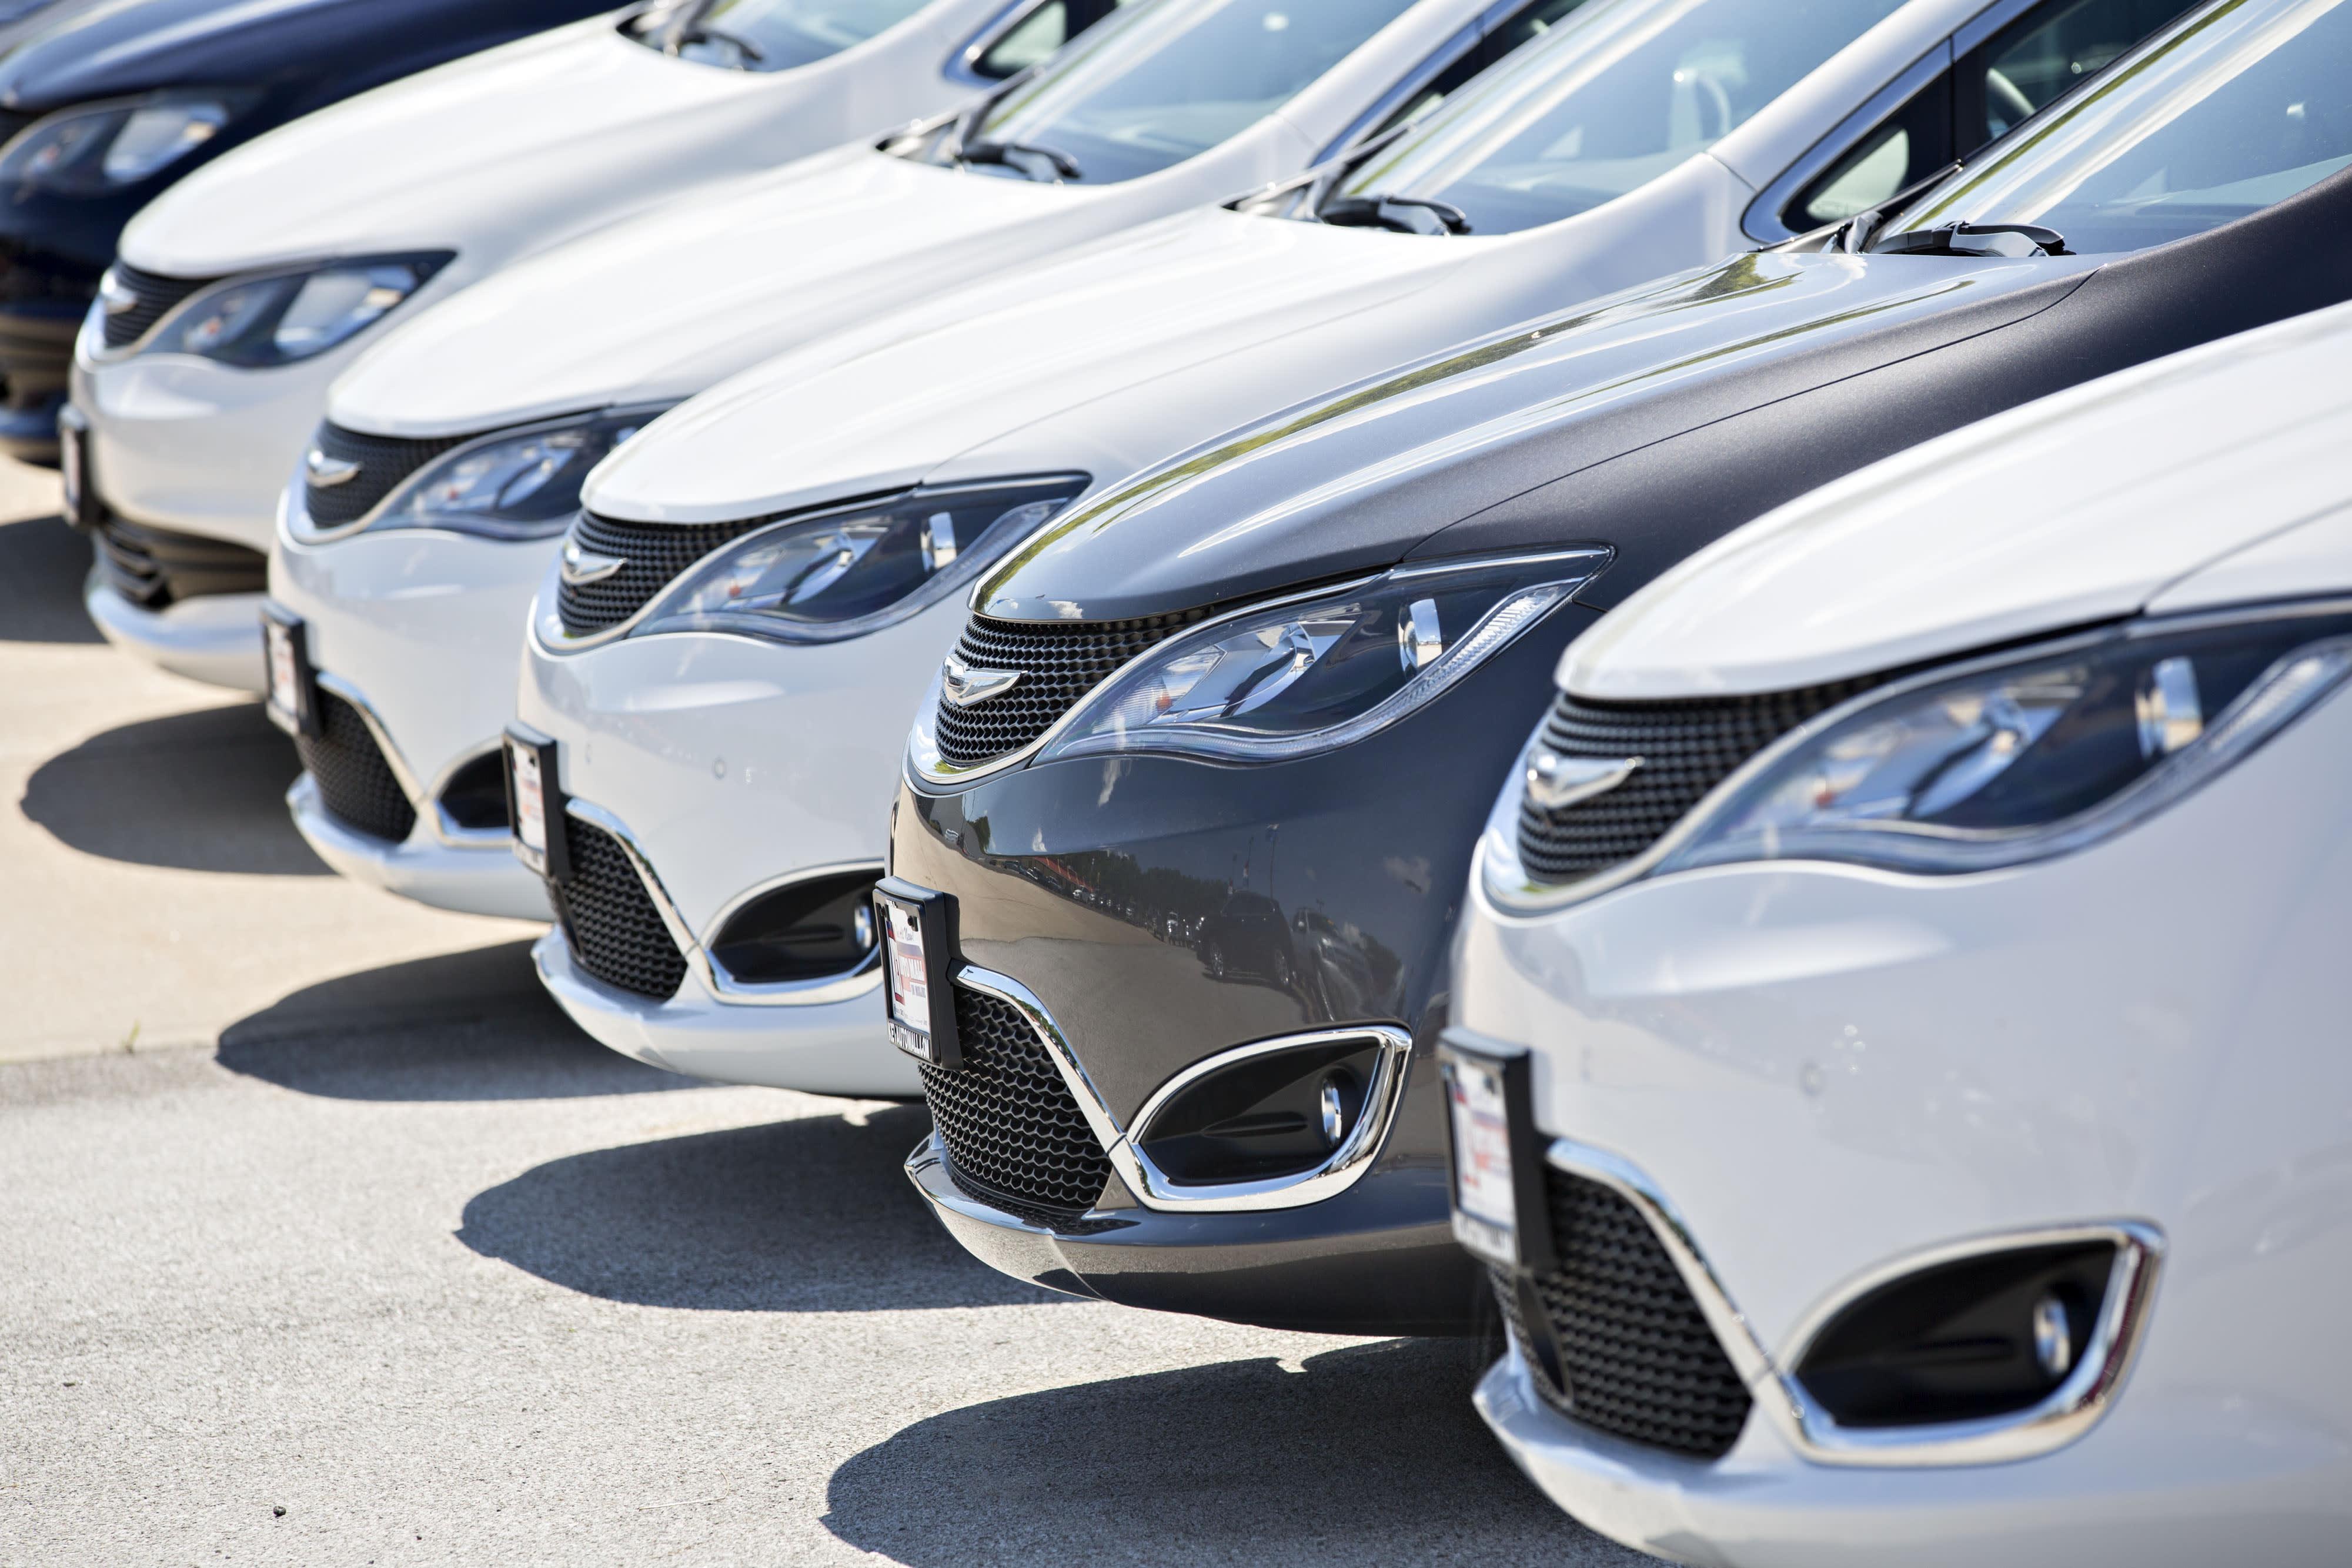 Shares leap higher after Fiat Chrysler and Renault propose merger